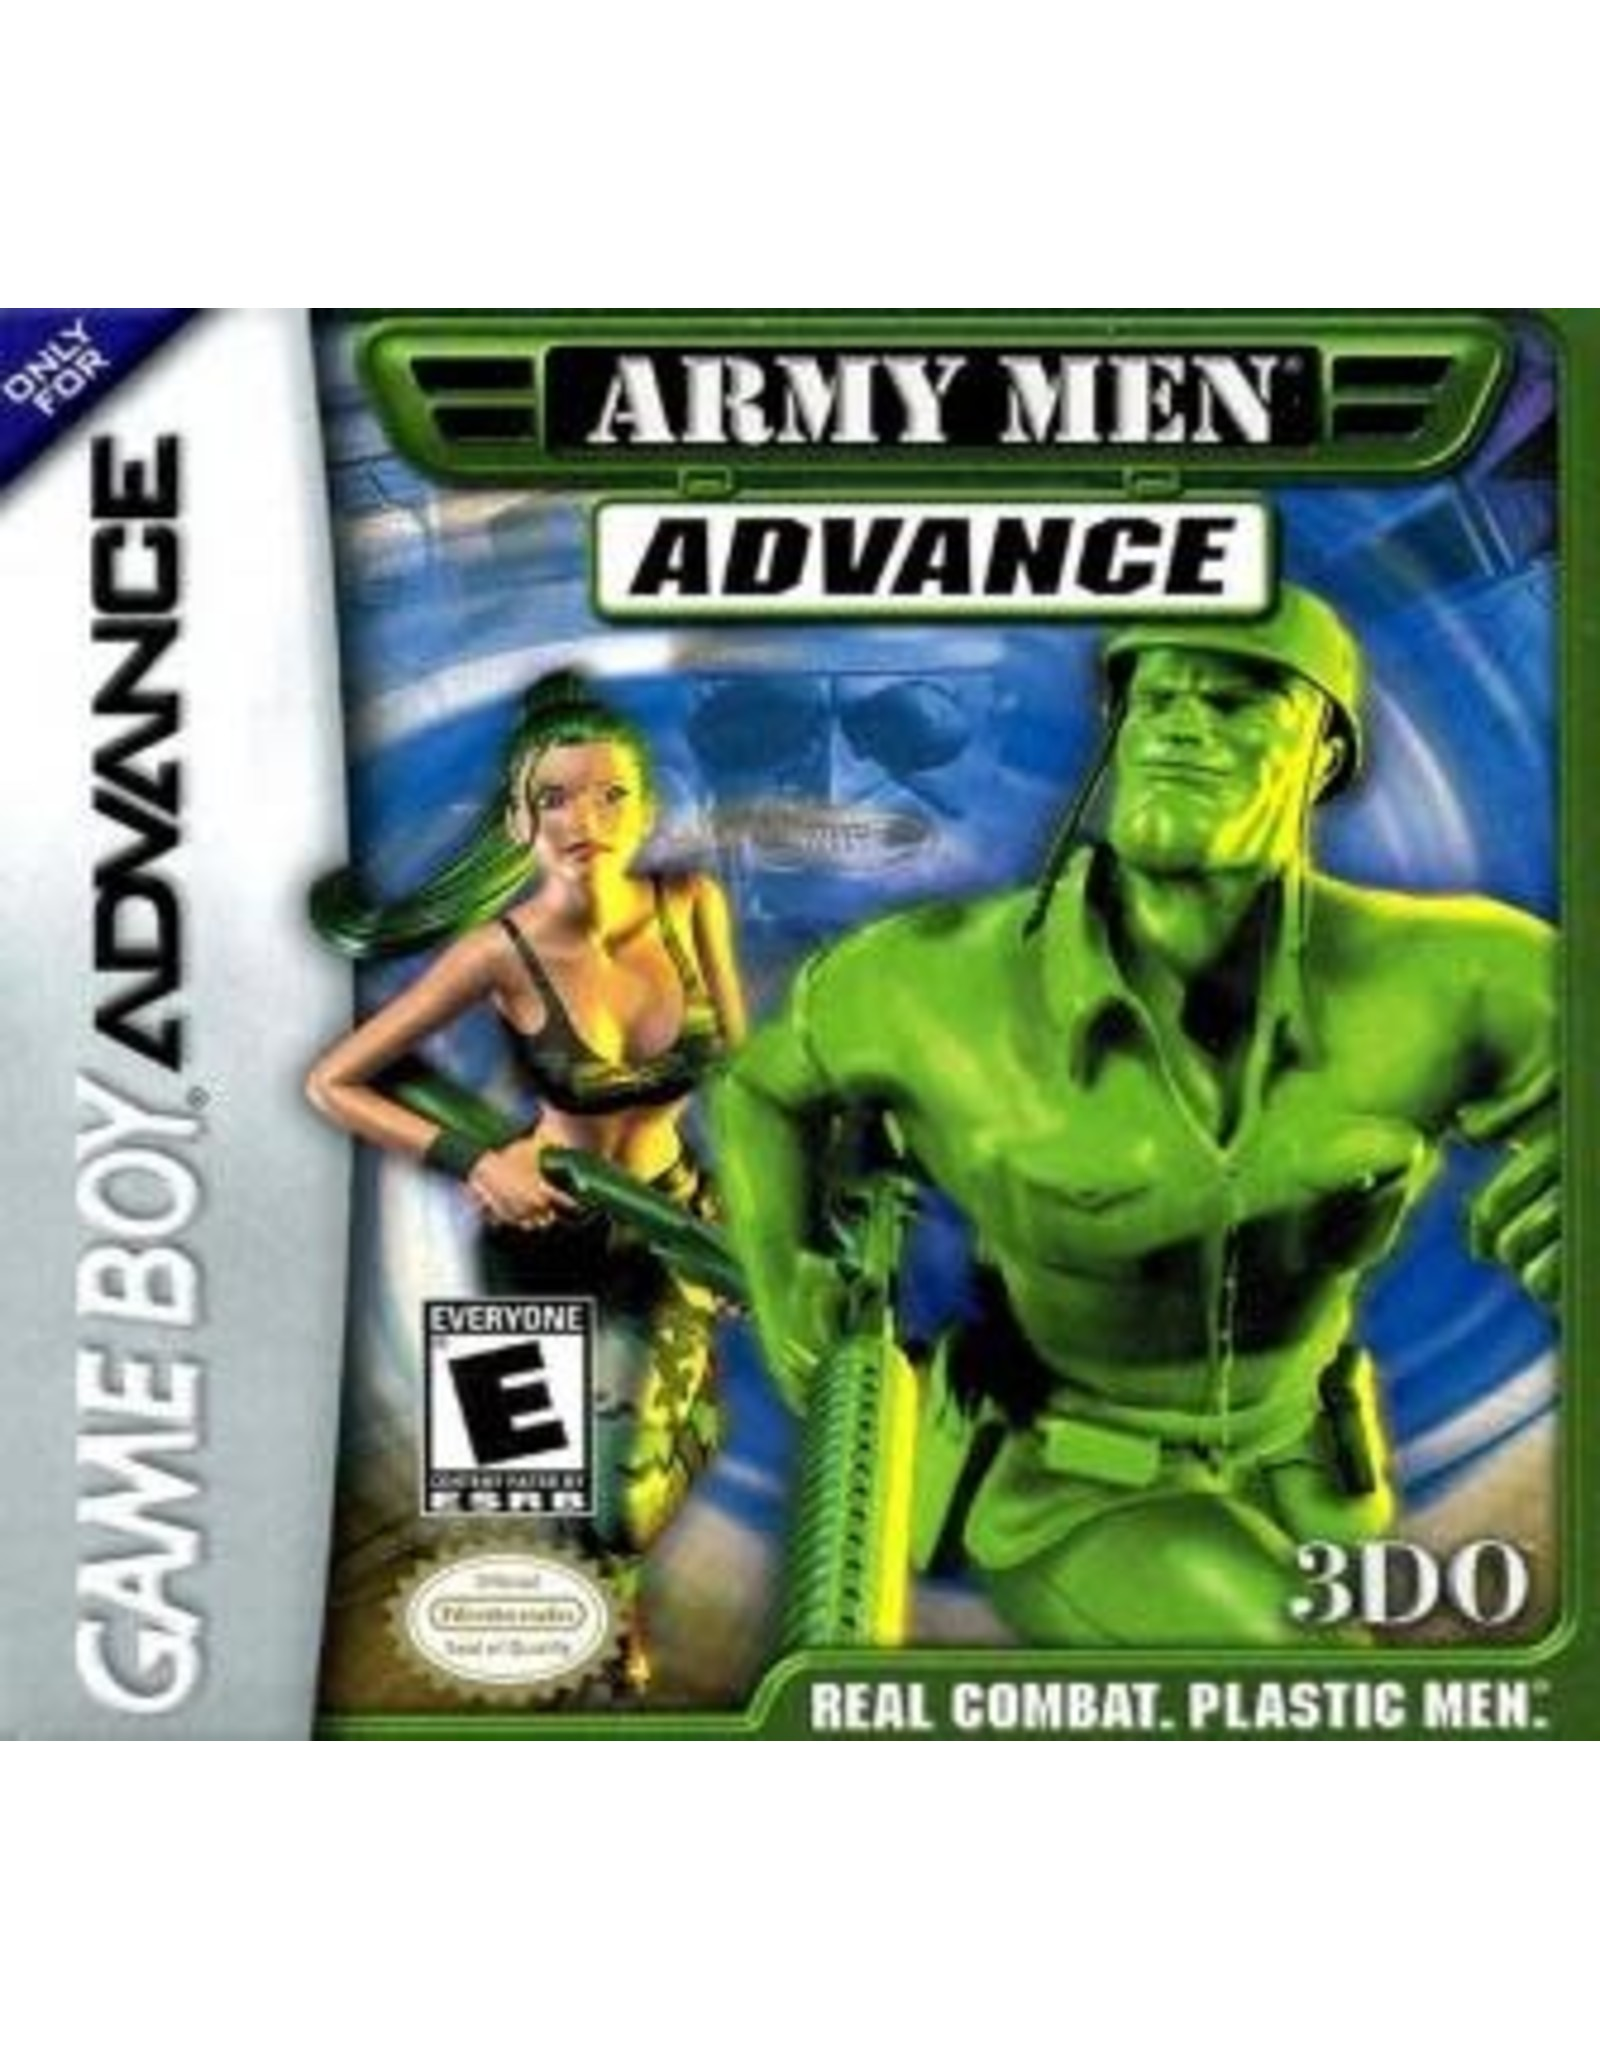 GameBoy Advance Army Men Advance (Cart Only)